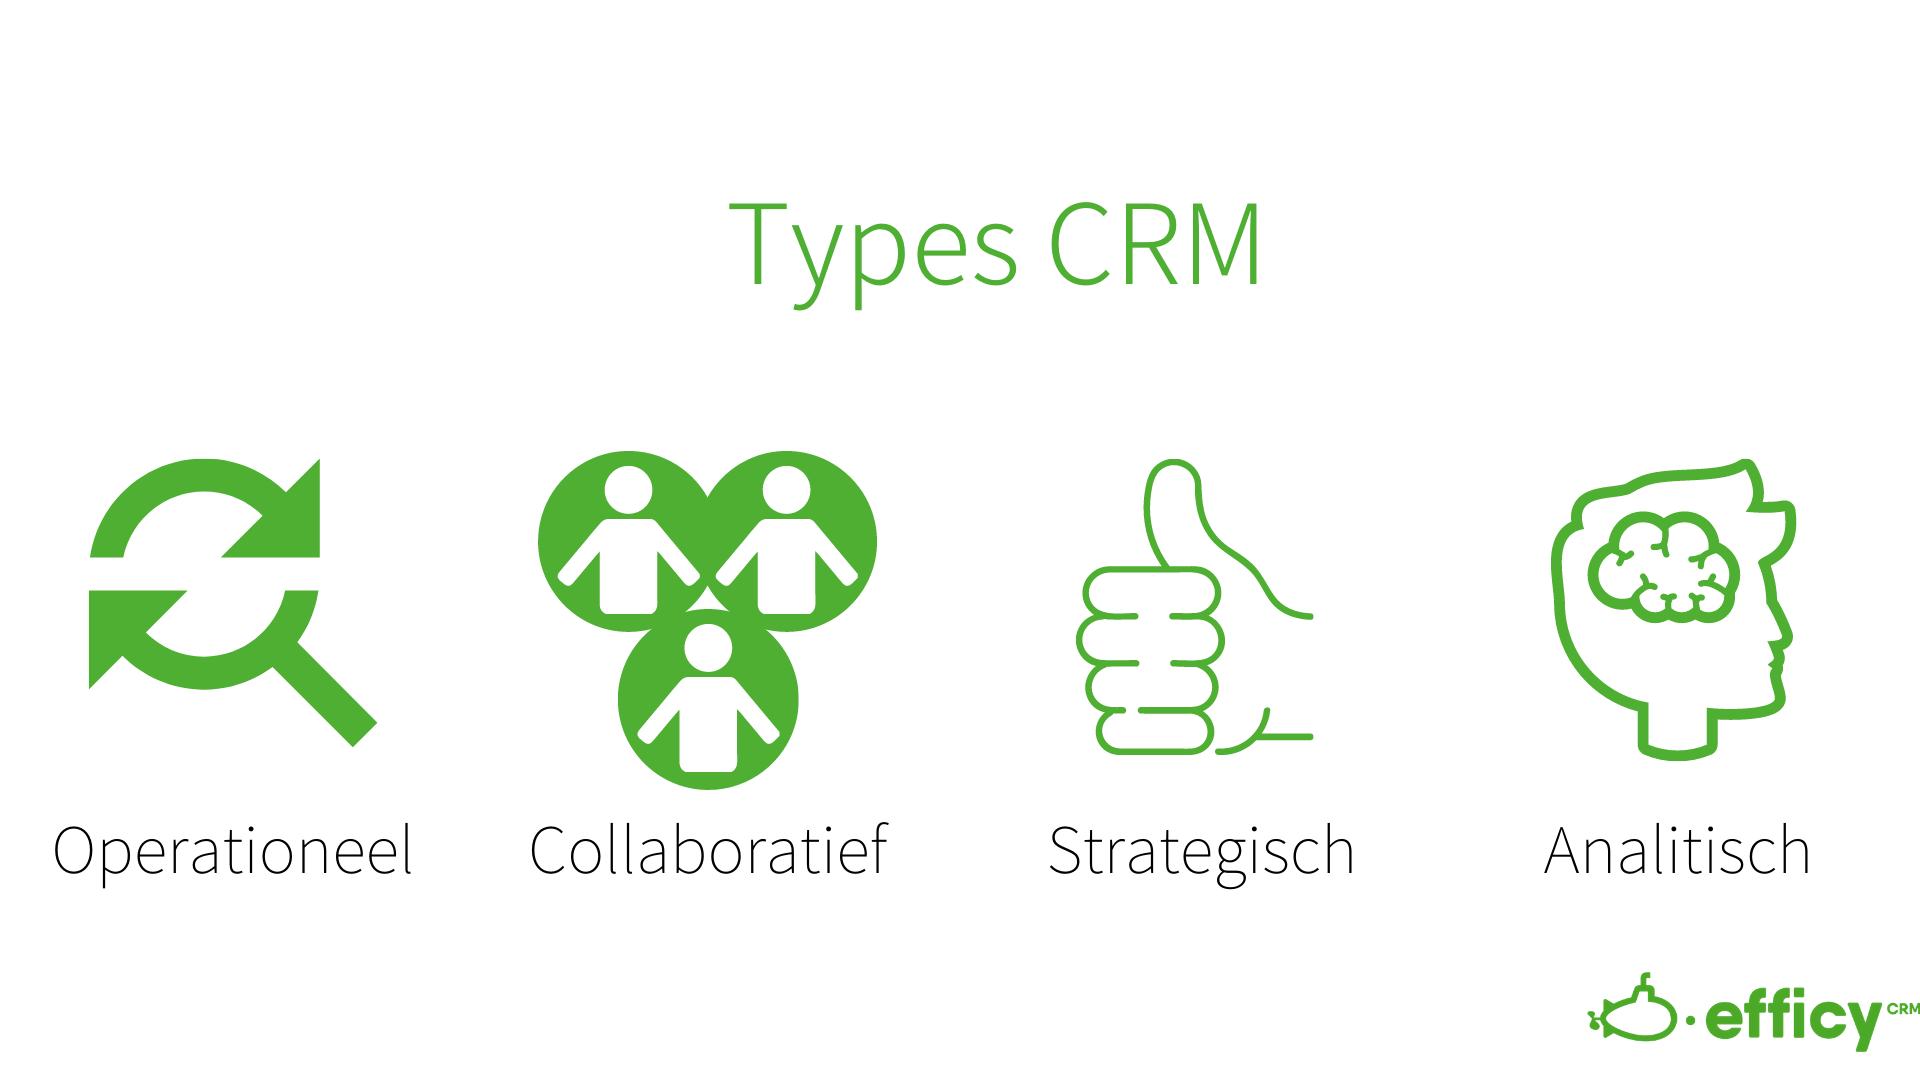 Types CRM